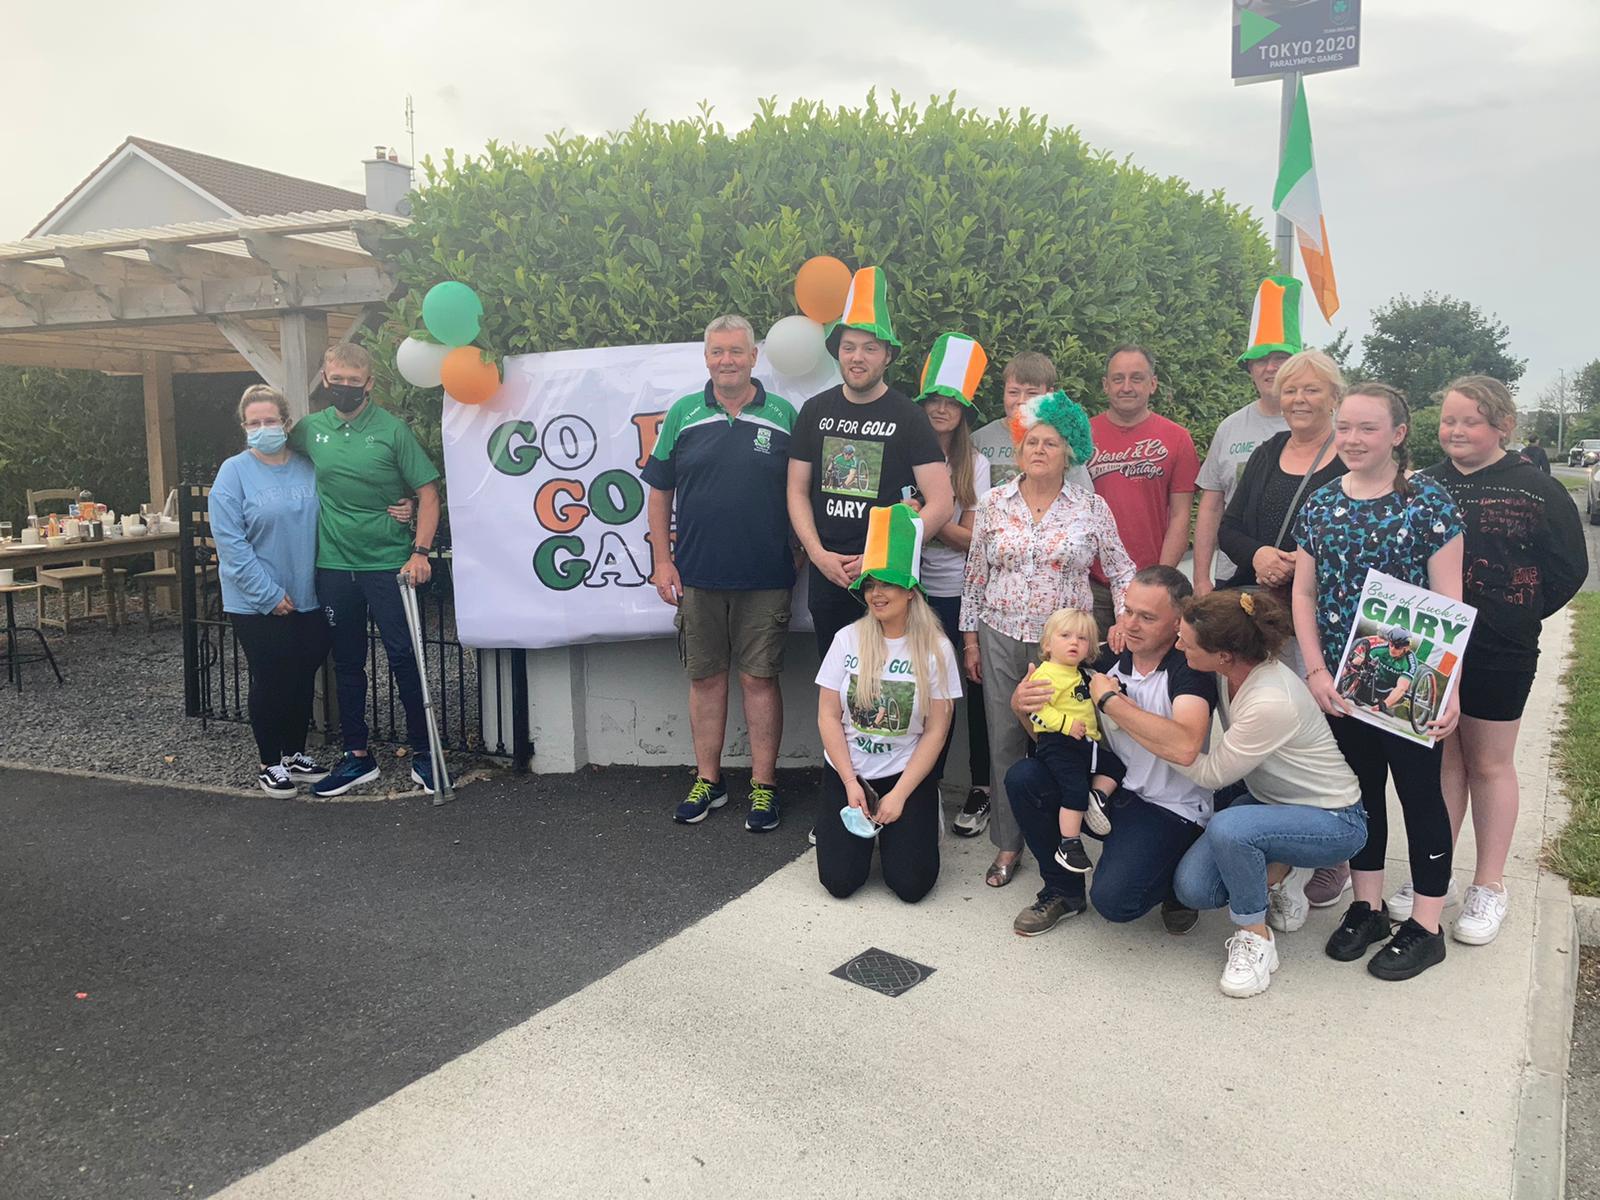 Gary O'Reilly Paralympics